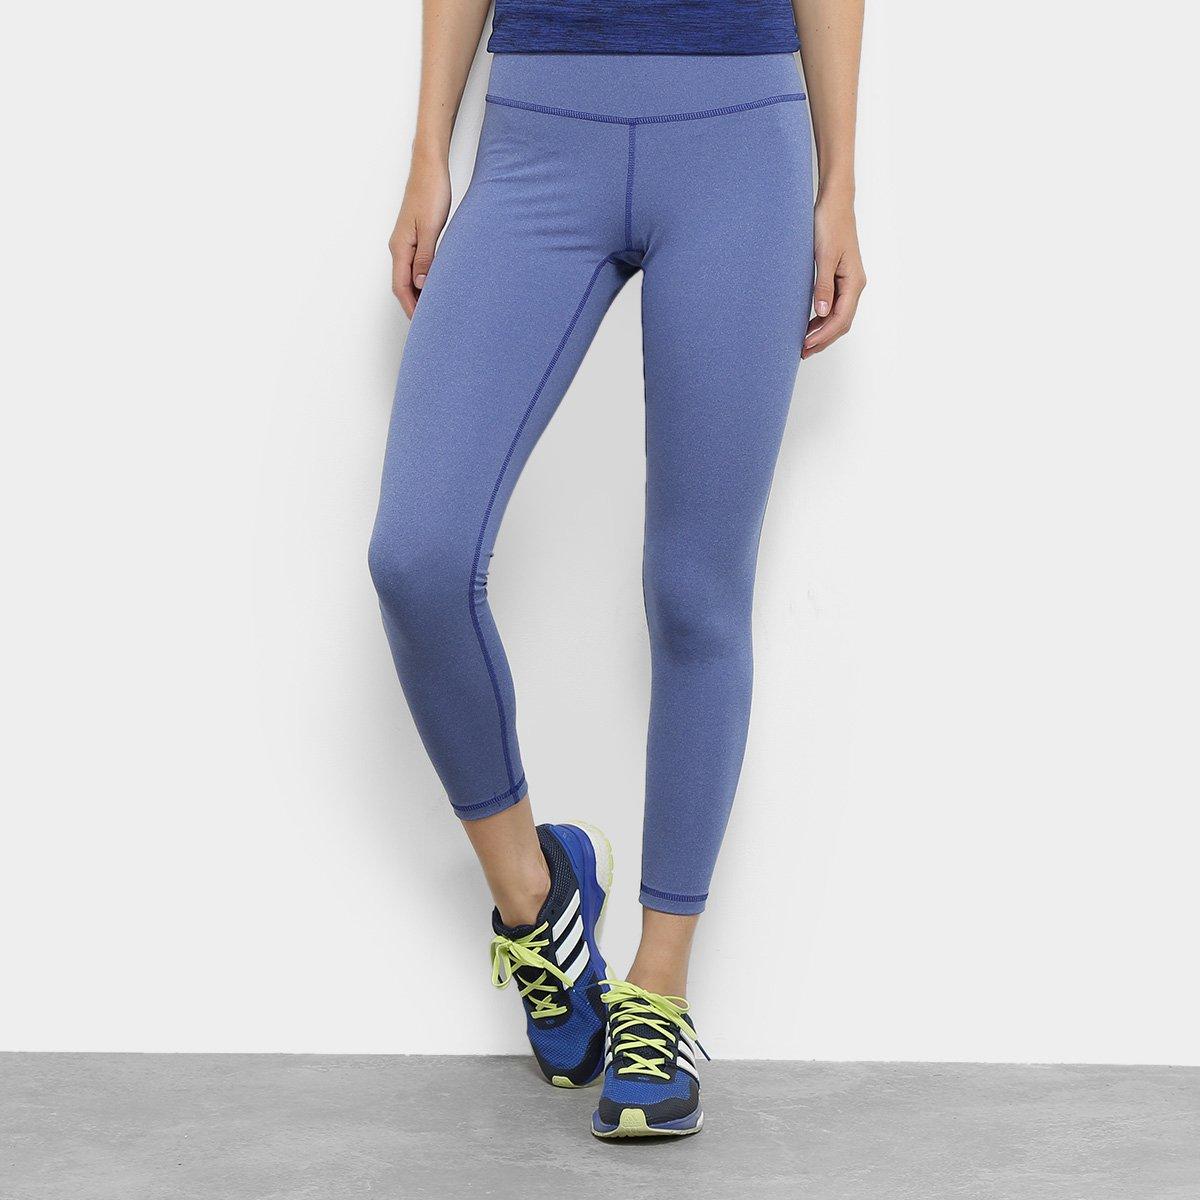 b66f1e476 Calça Legging Adidas Believe This 7/8 Feminina